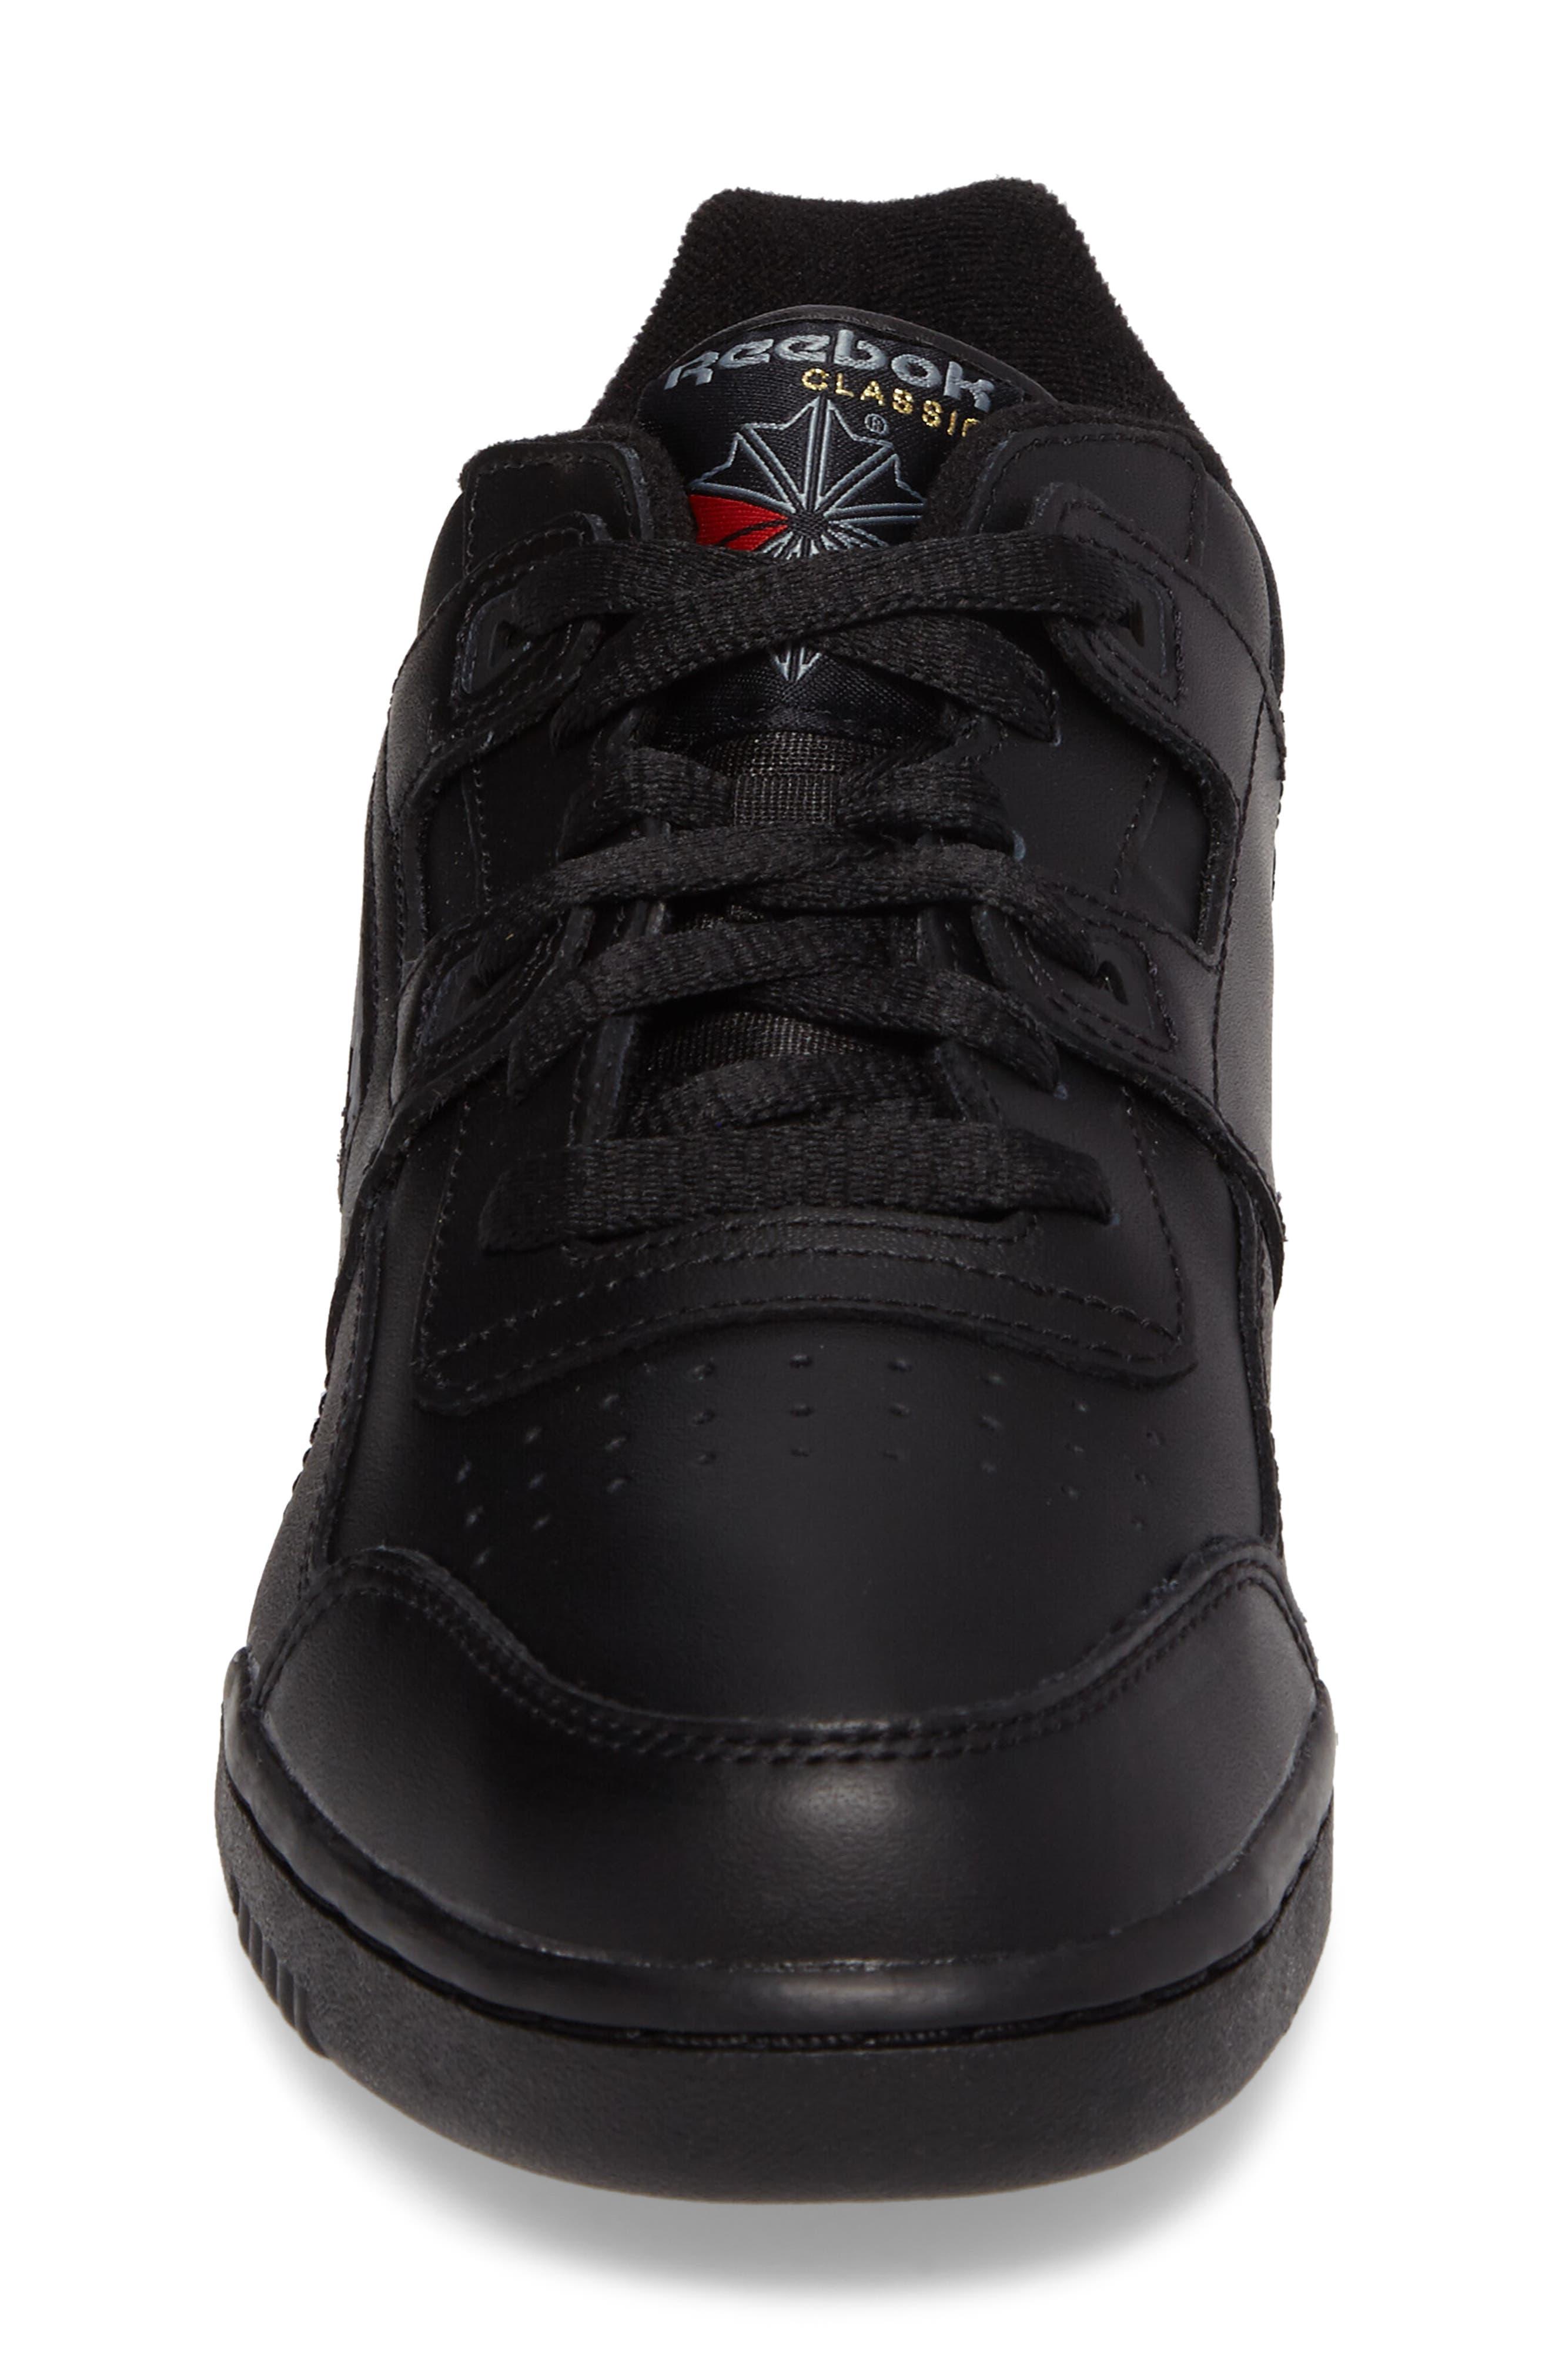 Workout Plus Sneaker,                             Alternate thumbnail 4, color,                             Black/ Charcoal